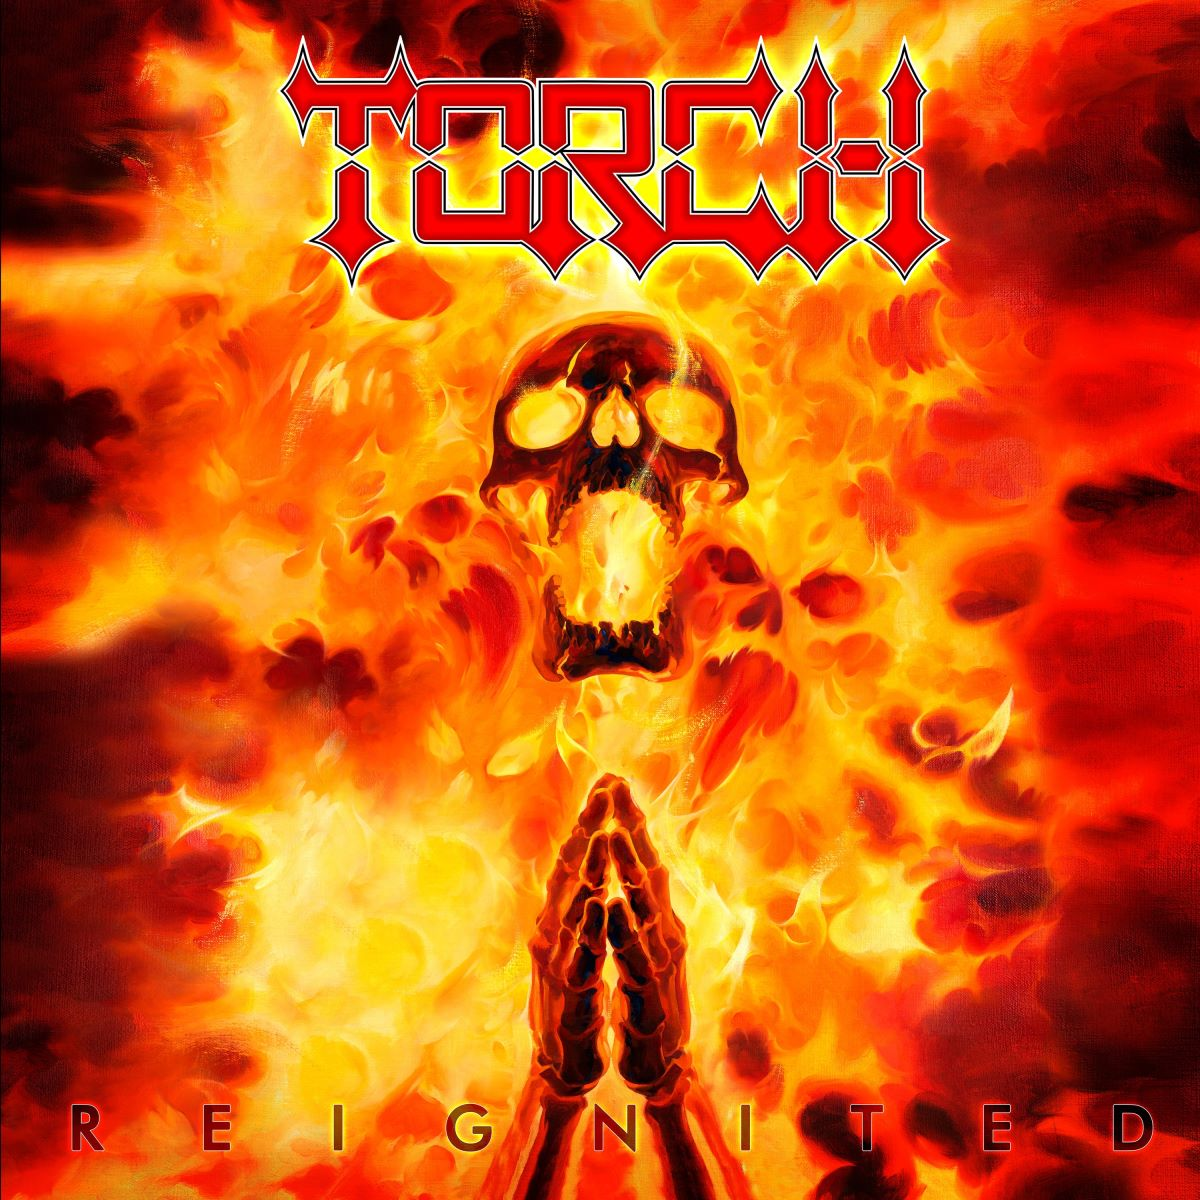 Torch - Reignited - album cover